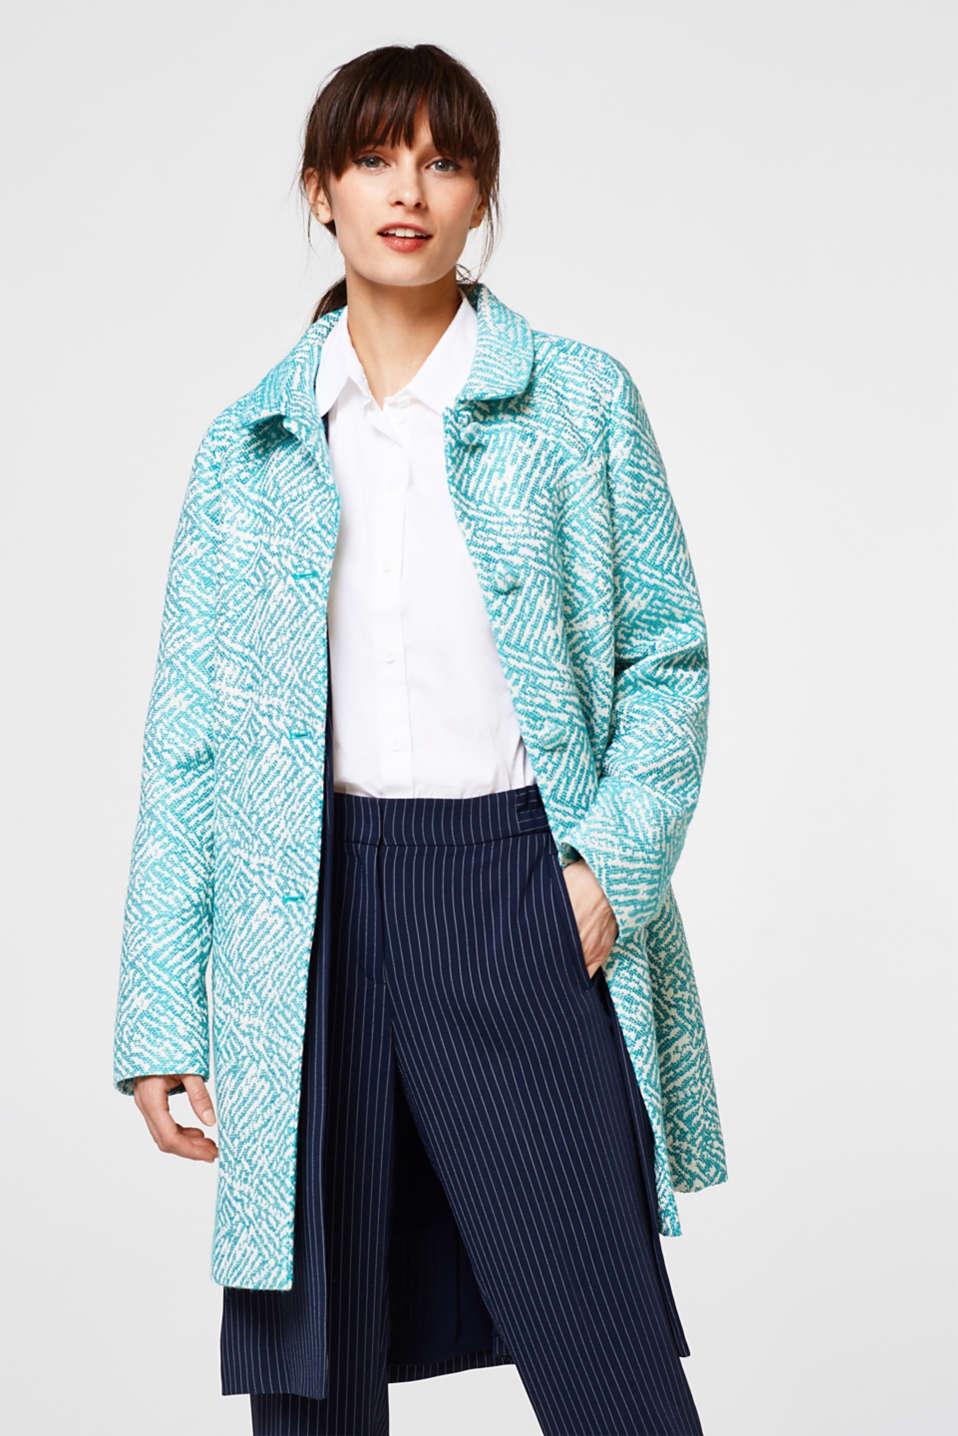 esprit jacquard mantel mit baumwolle im online shop kaufen. Black Bedroom Furniture Sets. Home Design Ideas